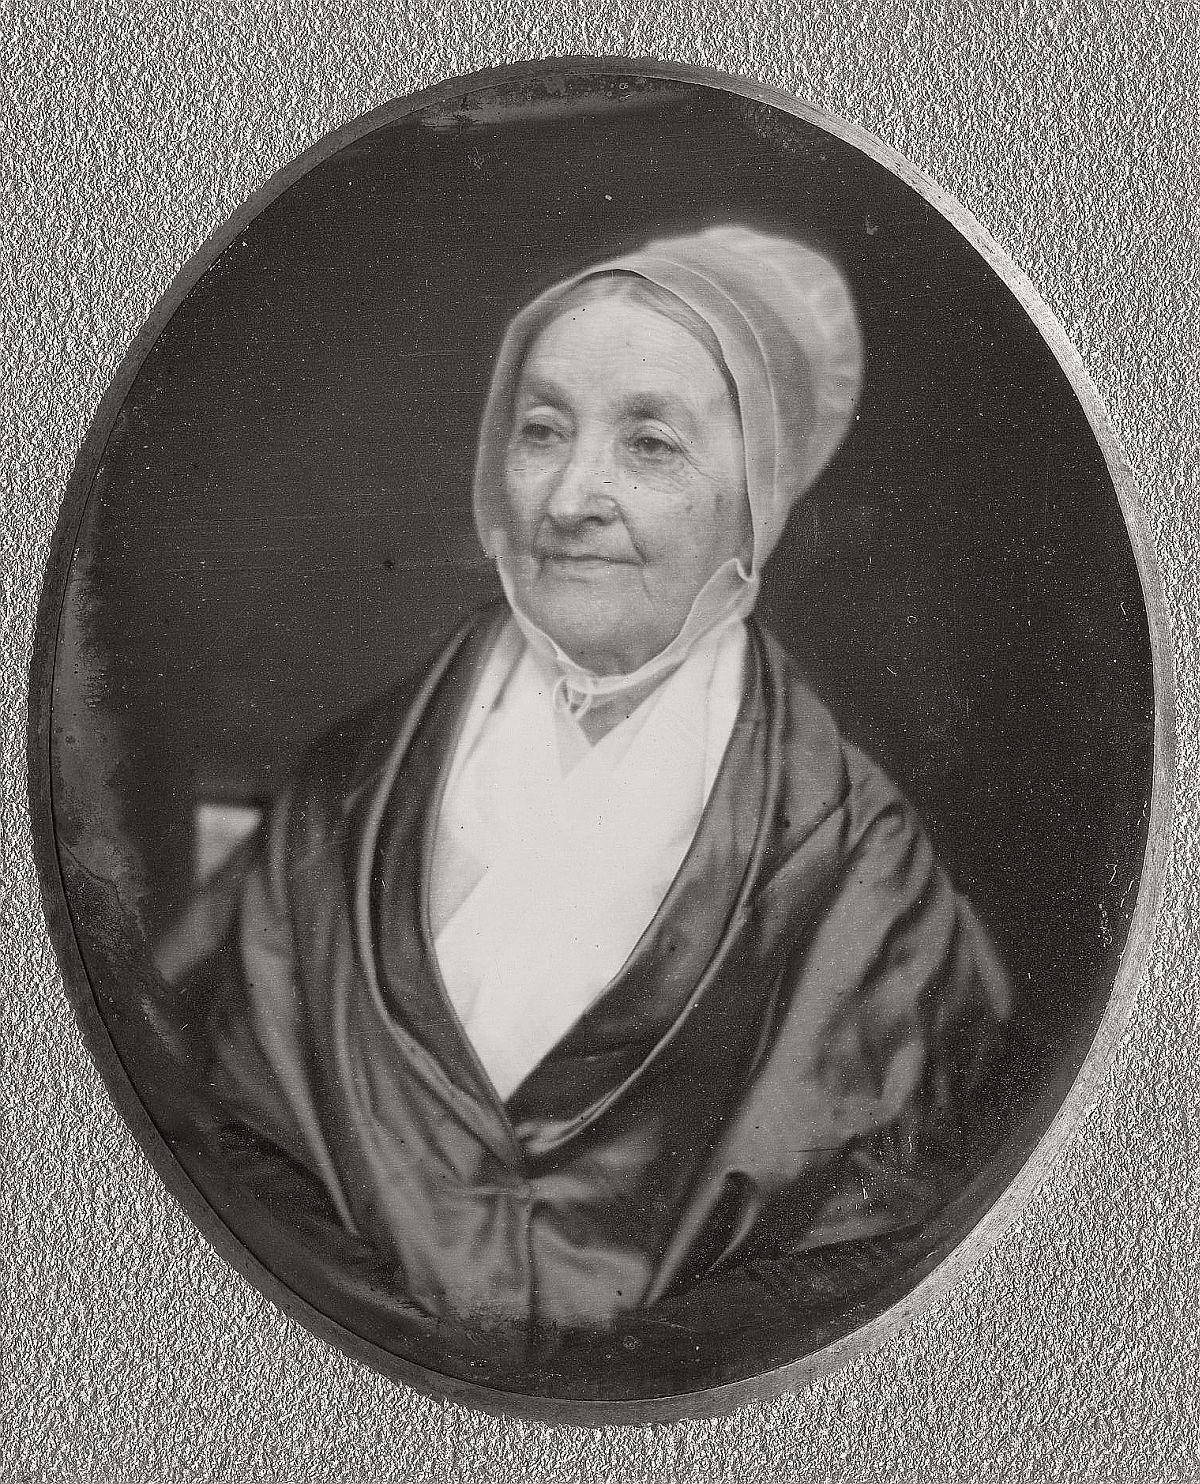 daguerreotype-portrait-ladies-born-in-the-late-18th-century-1700s-vintage-23